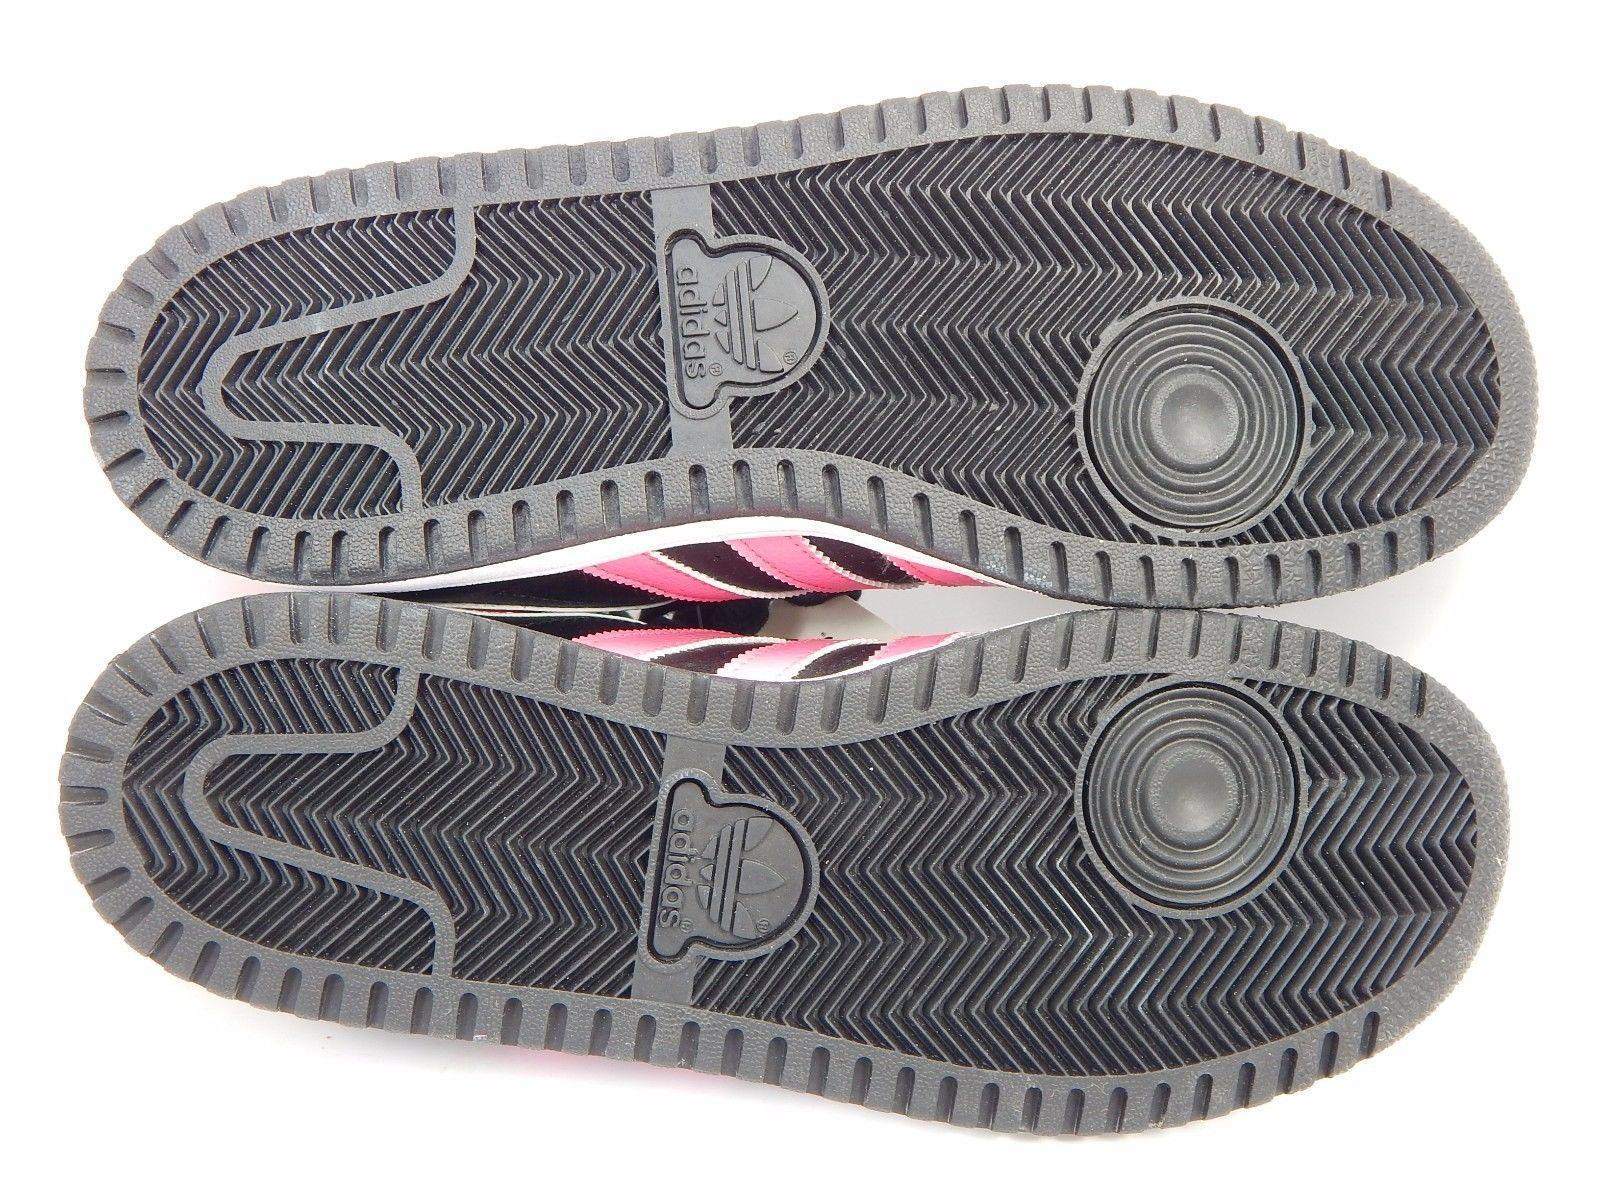 Adidas Top Ten Lo Top Kid's Girl's Basketball Shoes Size US 7 Y EU 40 C77189